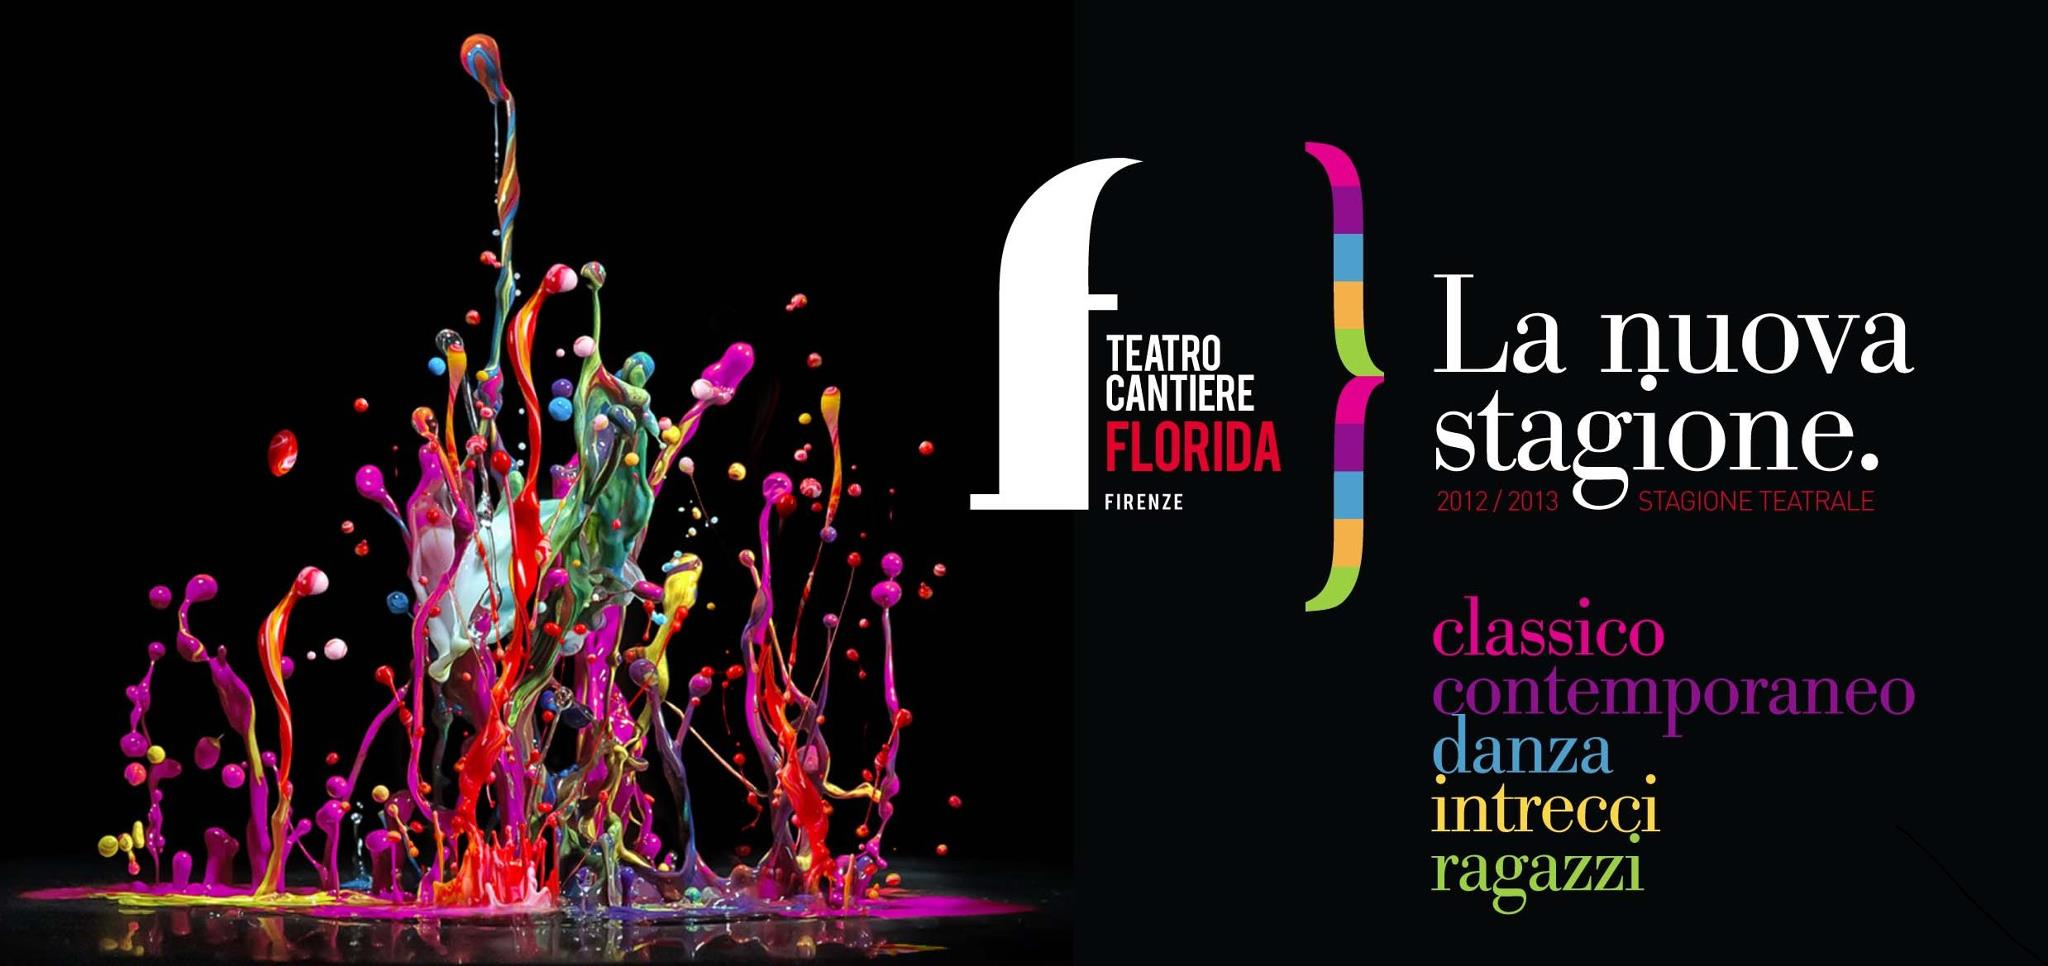 Teatro Cantiere Florida a Firenze stagione 2012-2013